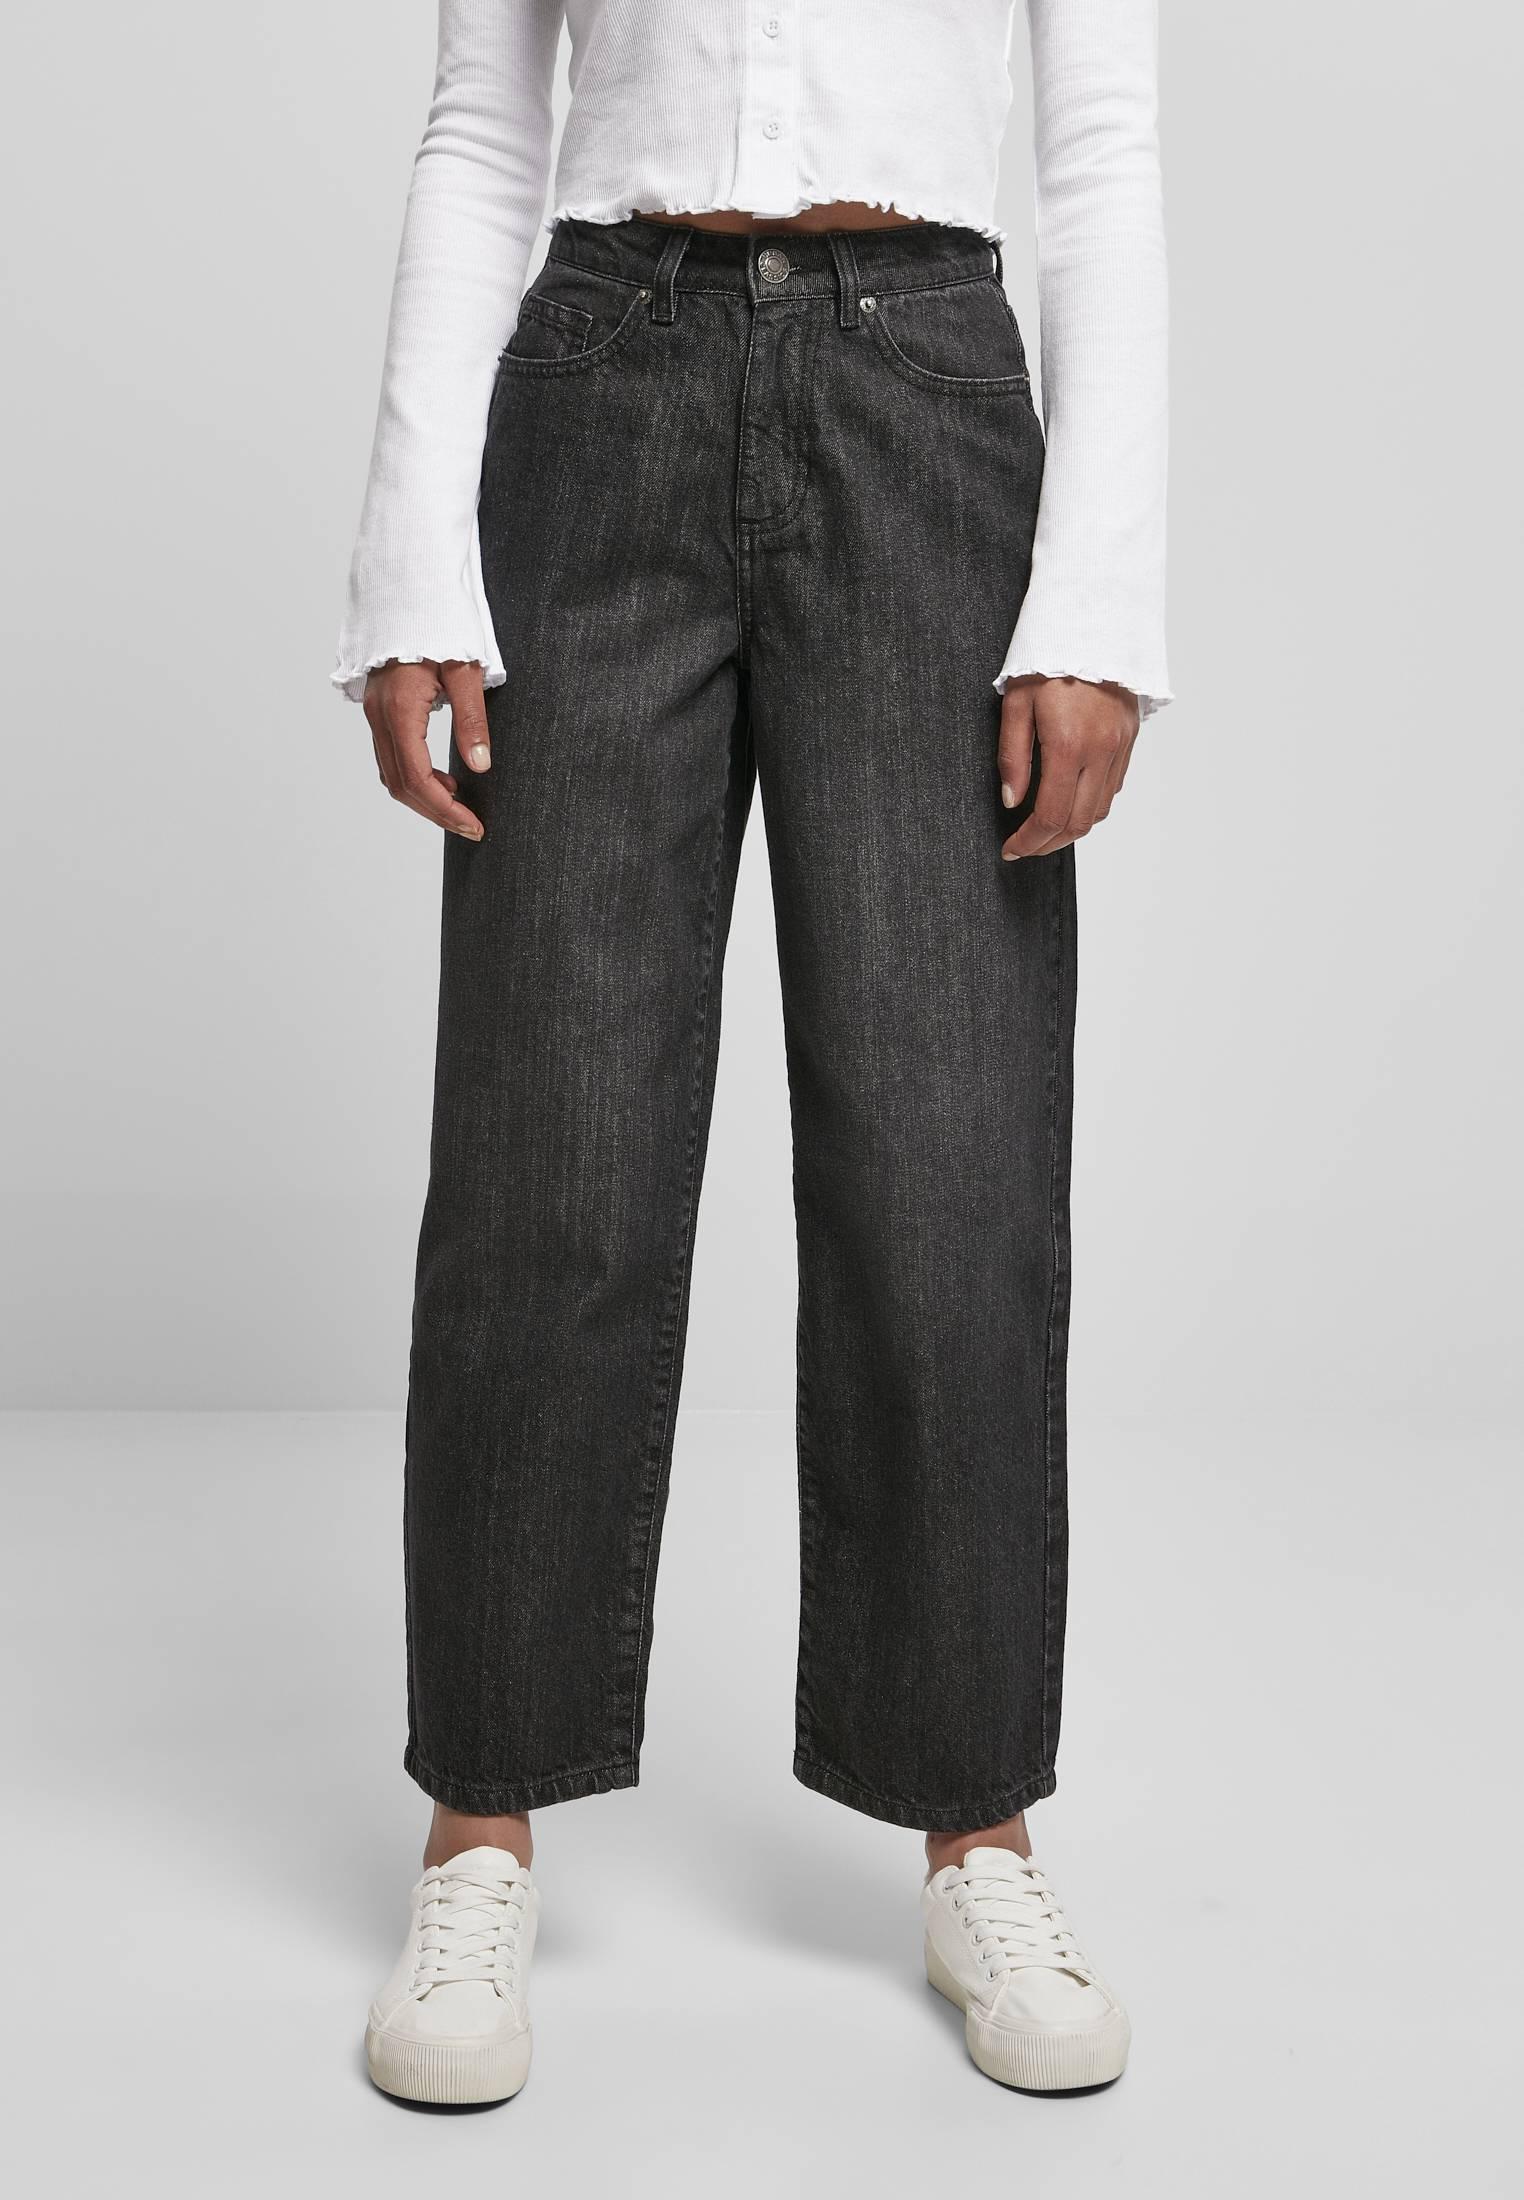 Urban Classics Ladies High Waist Wide Leg Cropped Denim Pants black washed - 28